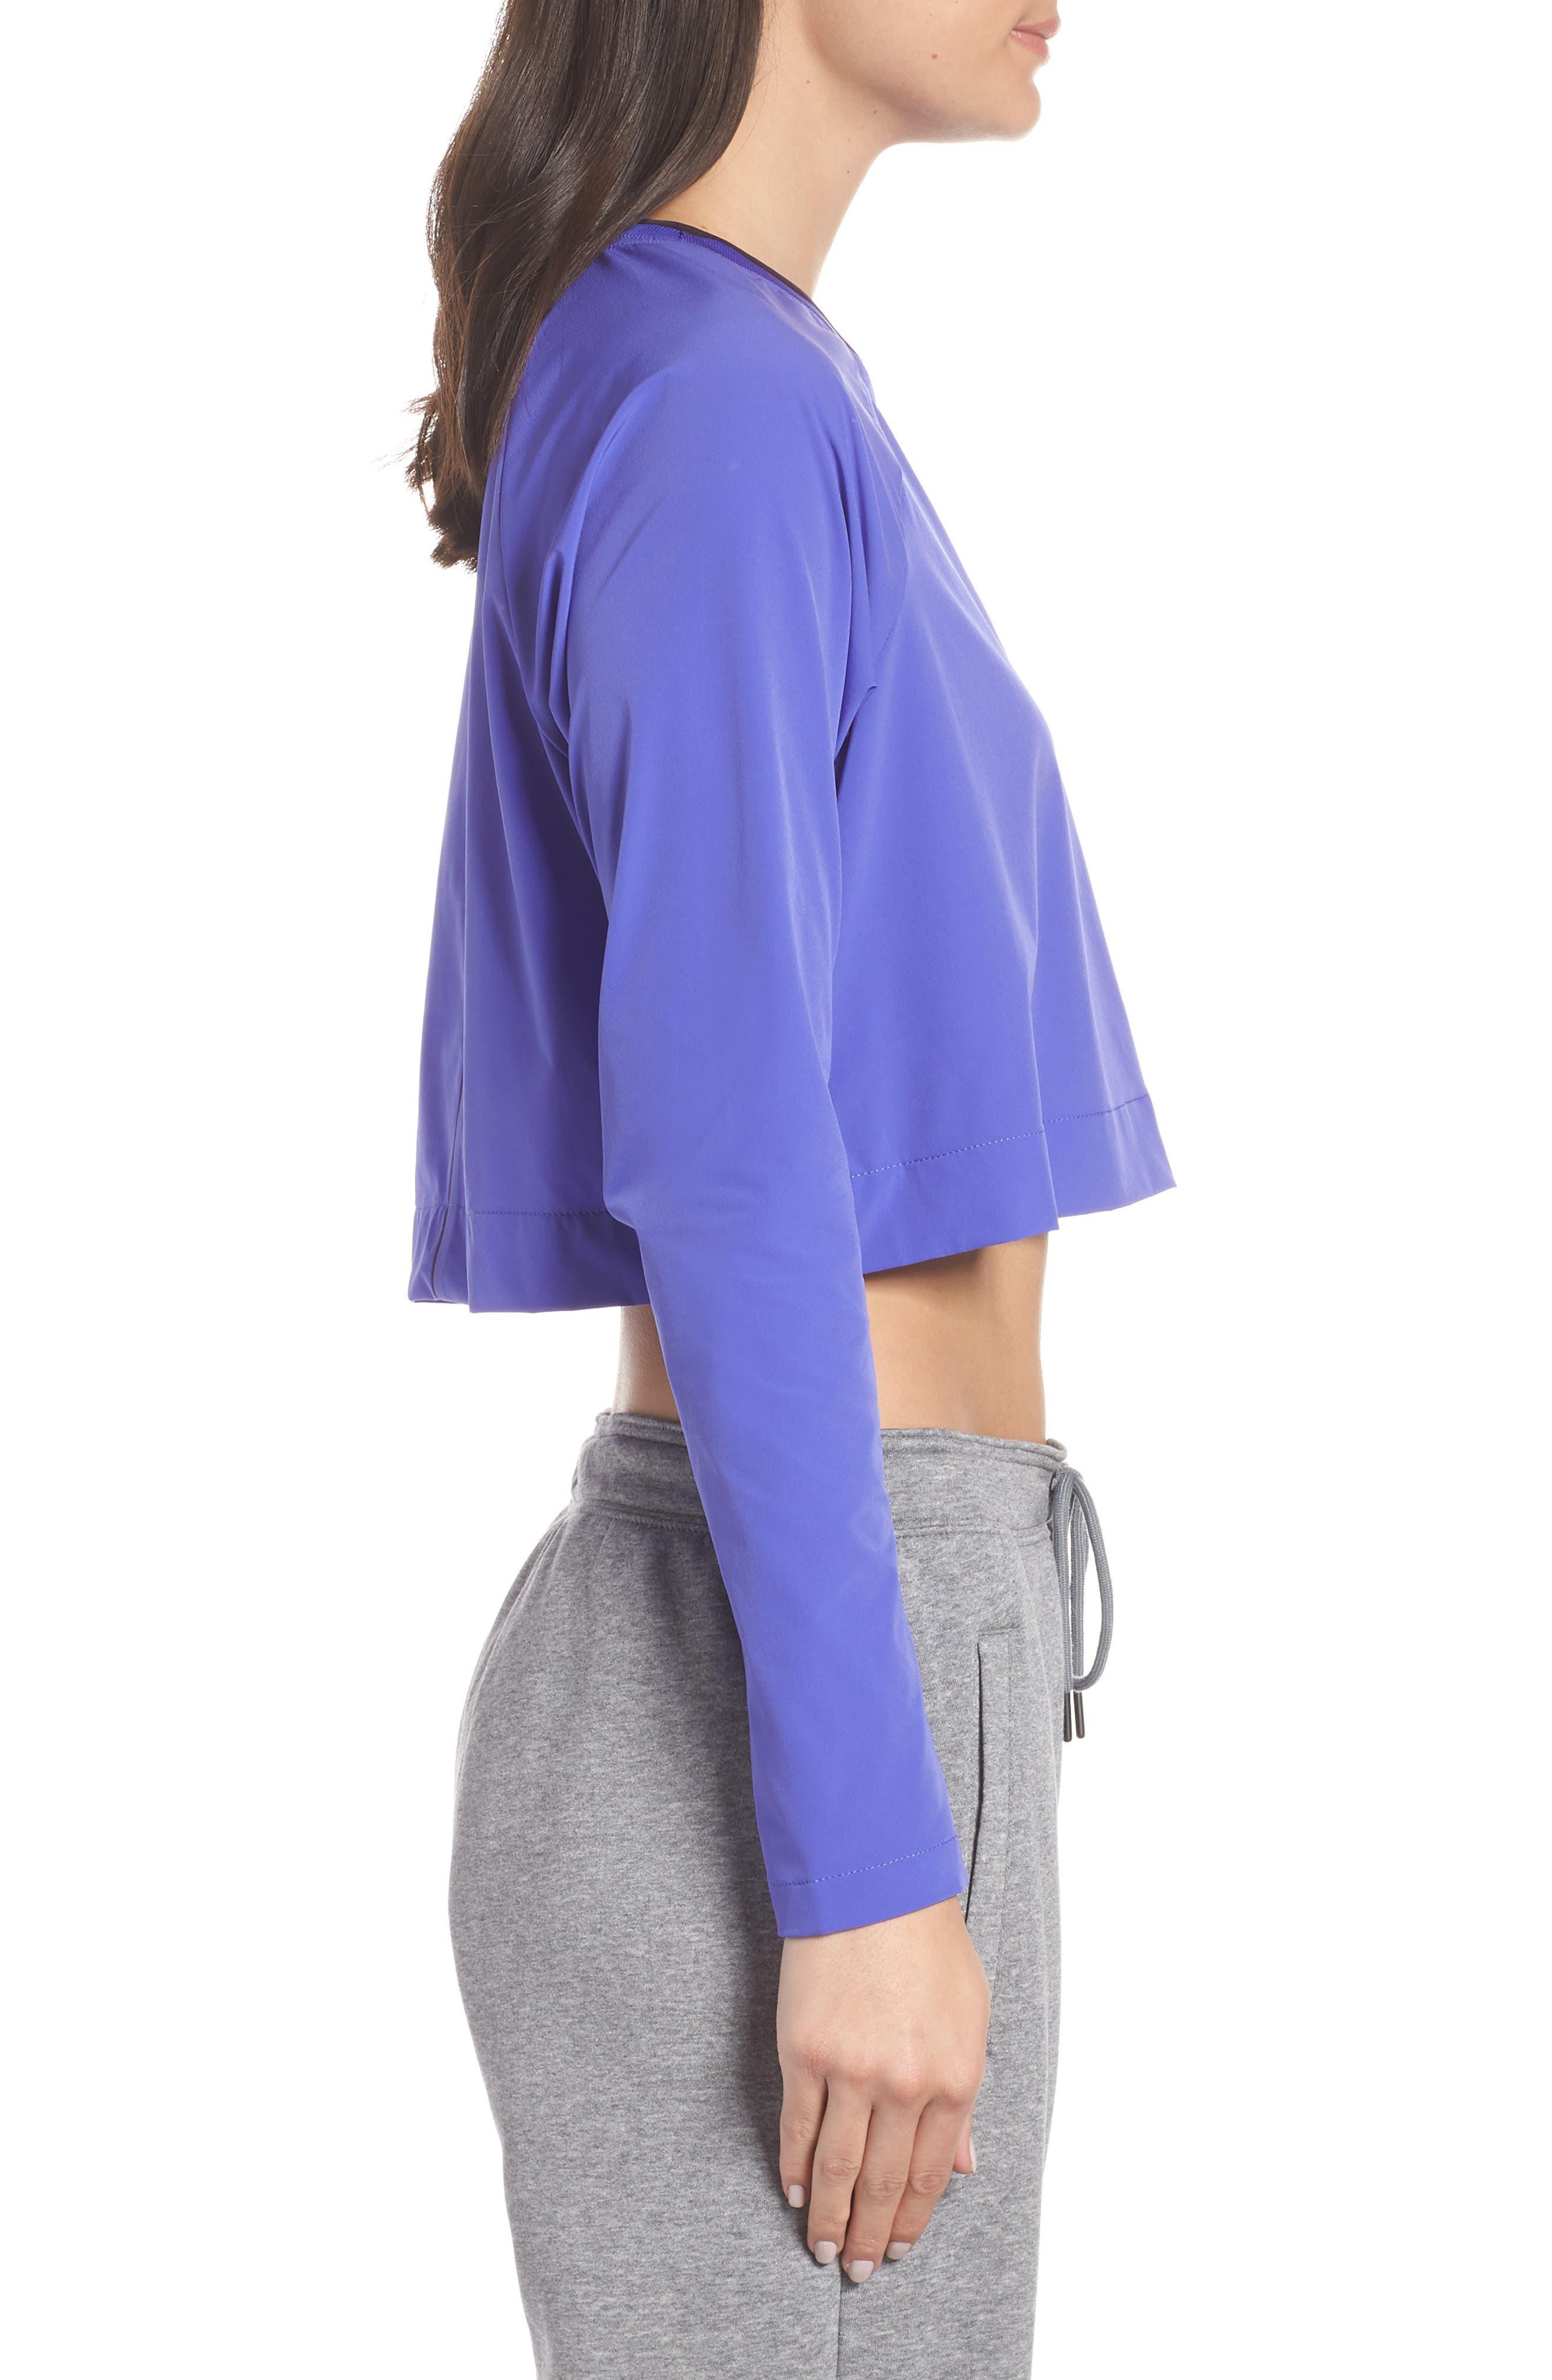 Sportswear Tech Pack Women's Long Sleeve Top,                             Alternate thumbnail 3, color,                             PERSIAN VIOLET/ BURGUNDY ASH